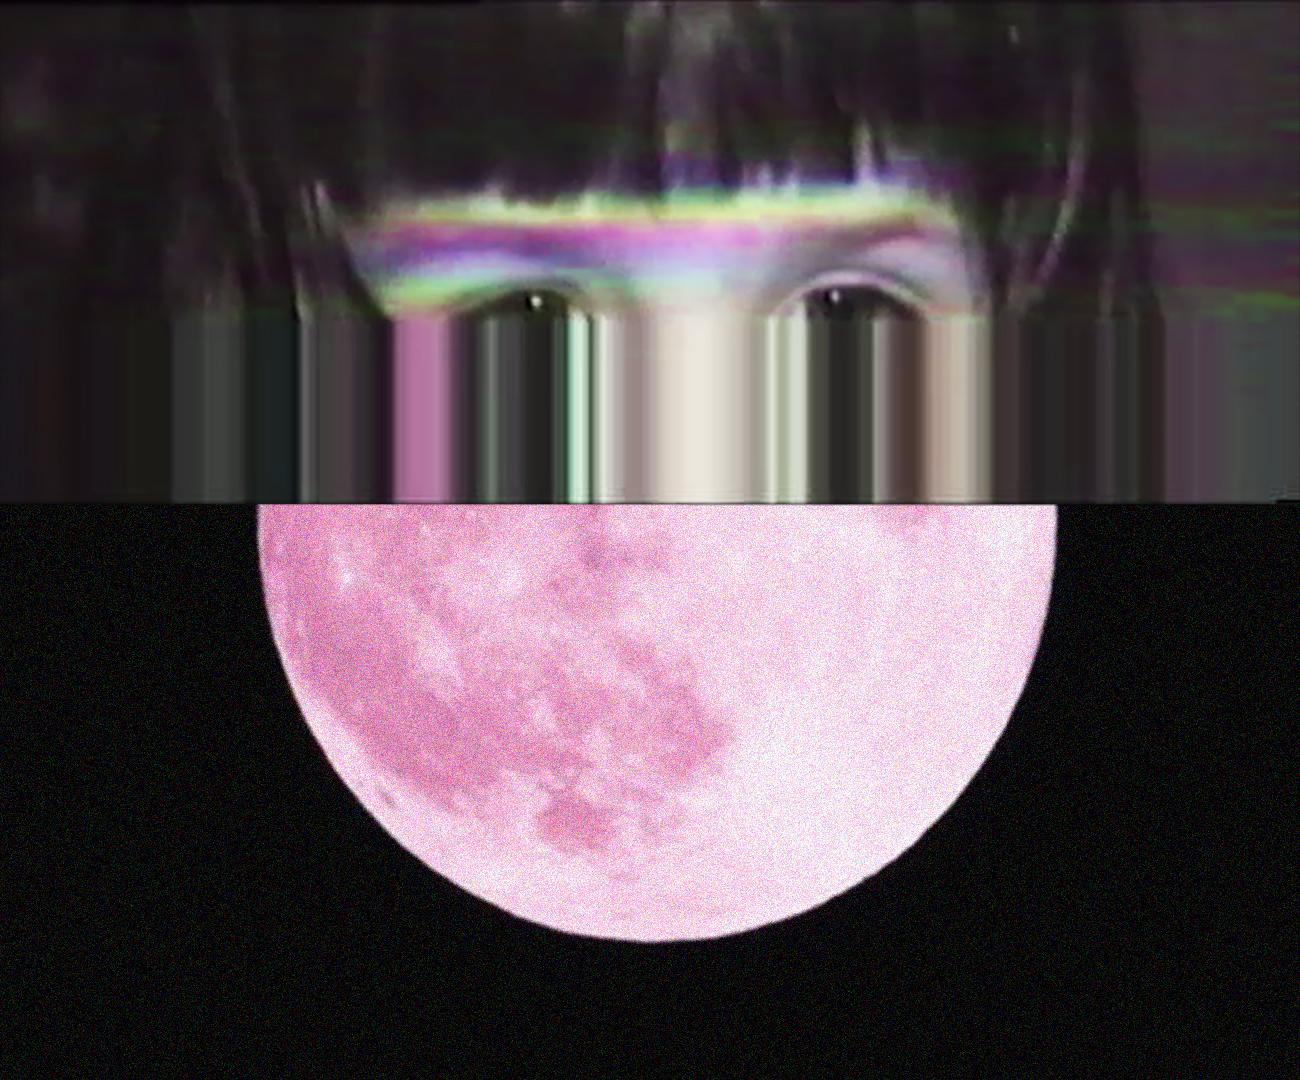 Dimitra Mitsaki, The Other Moon